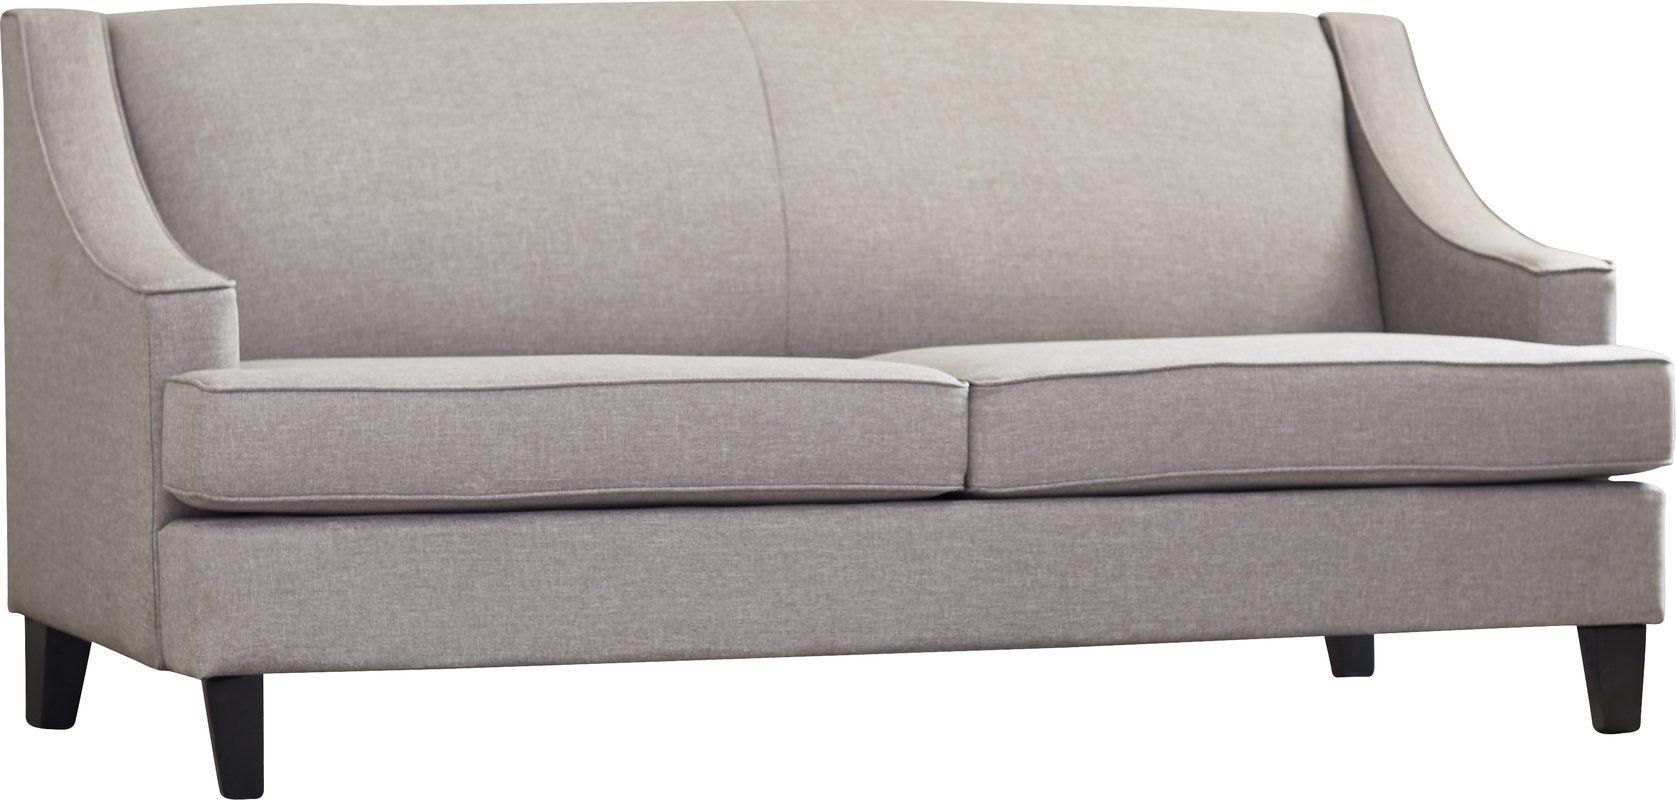 Rhinebeck Sofa Reviews Birch Lane Gray Sofa Sofa Sofas [ 800 x 1676 Pixel ]